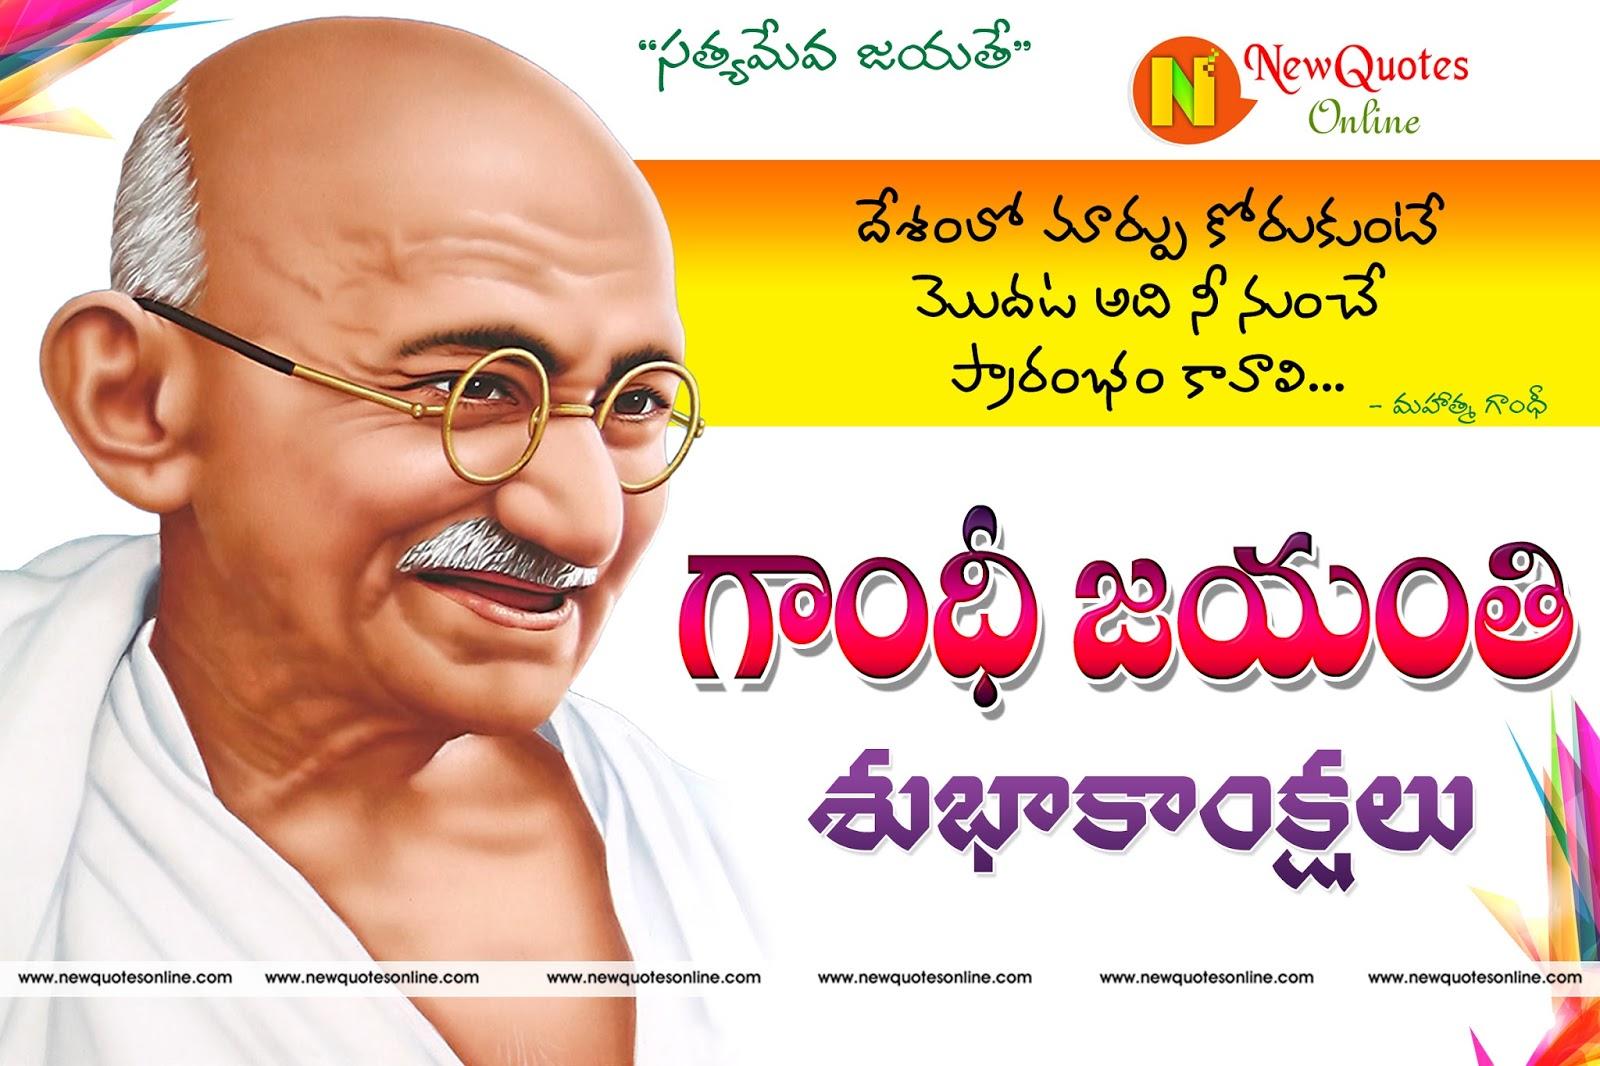 mahatma gandhiji in malayalam Download mahatma gandhi stories malayalam - real advice gandhi.